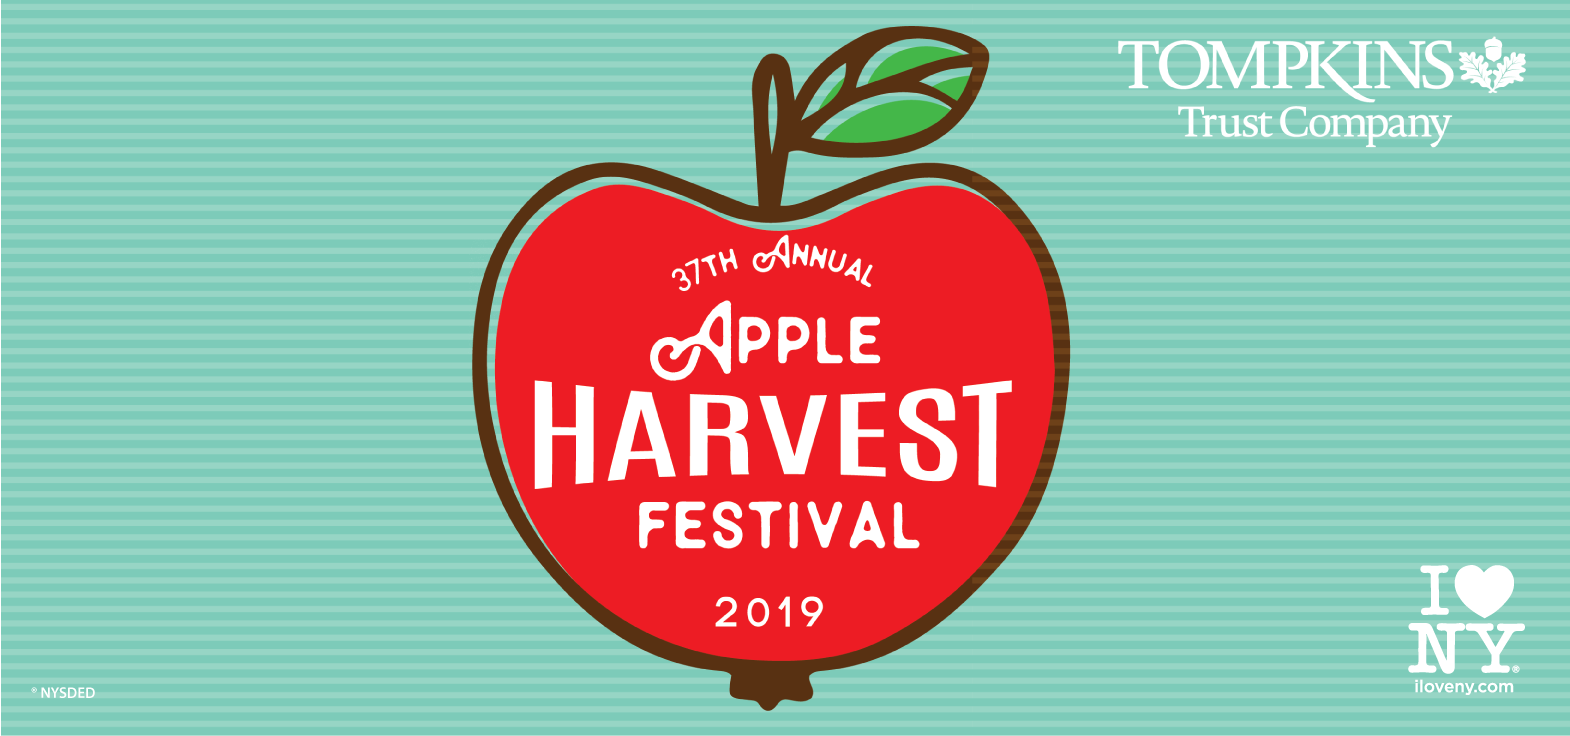 Apple Harvest Festival 2019 Image